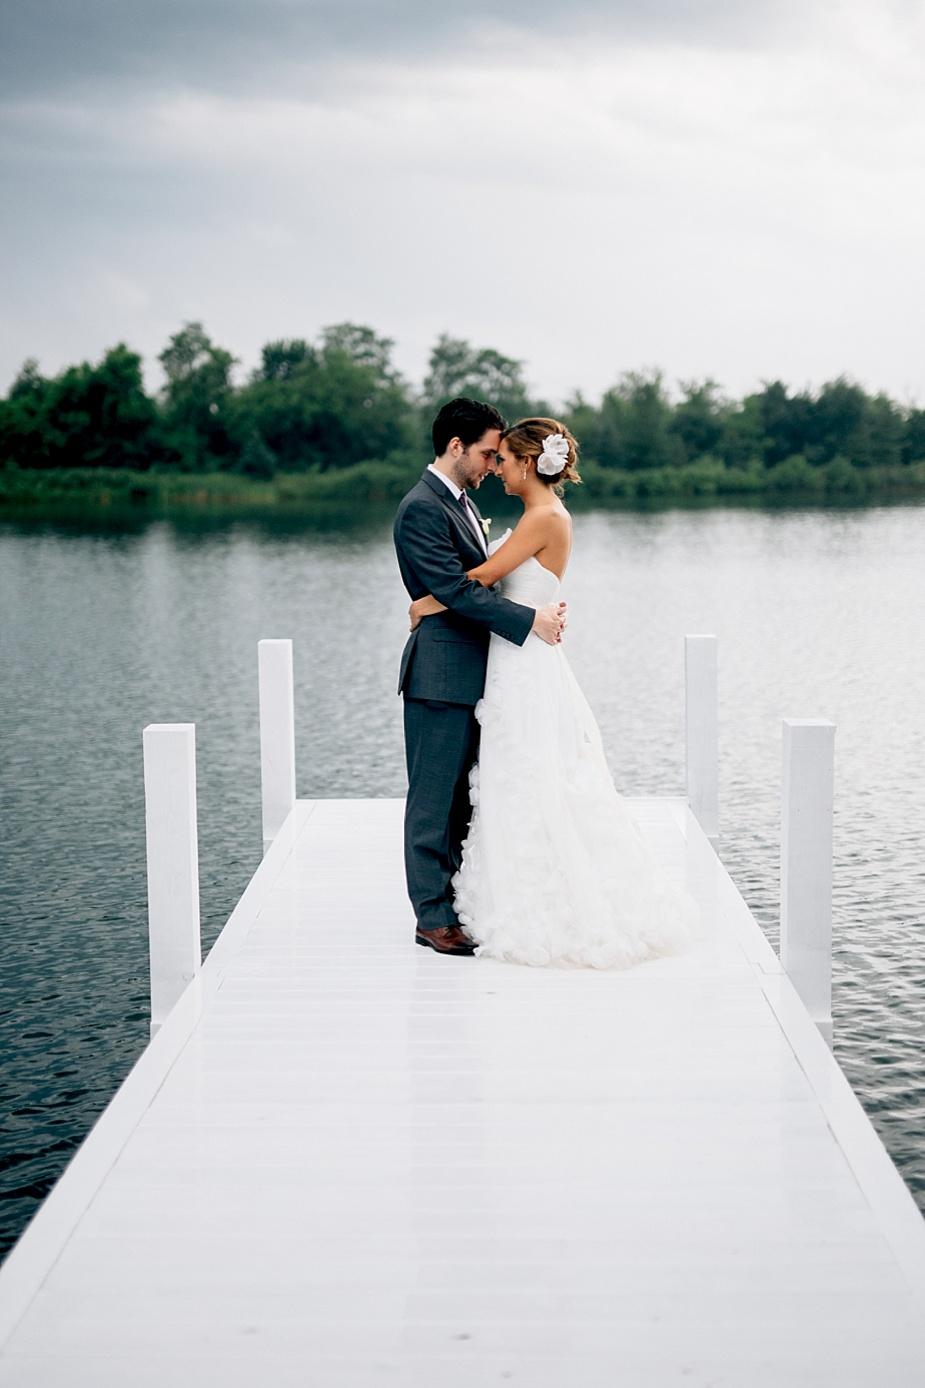 Alex+Becky-Lakeside-Backyard-Wedding_Milwaukee_Wedding_Photographer_0065.jpg